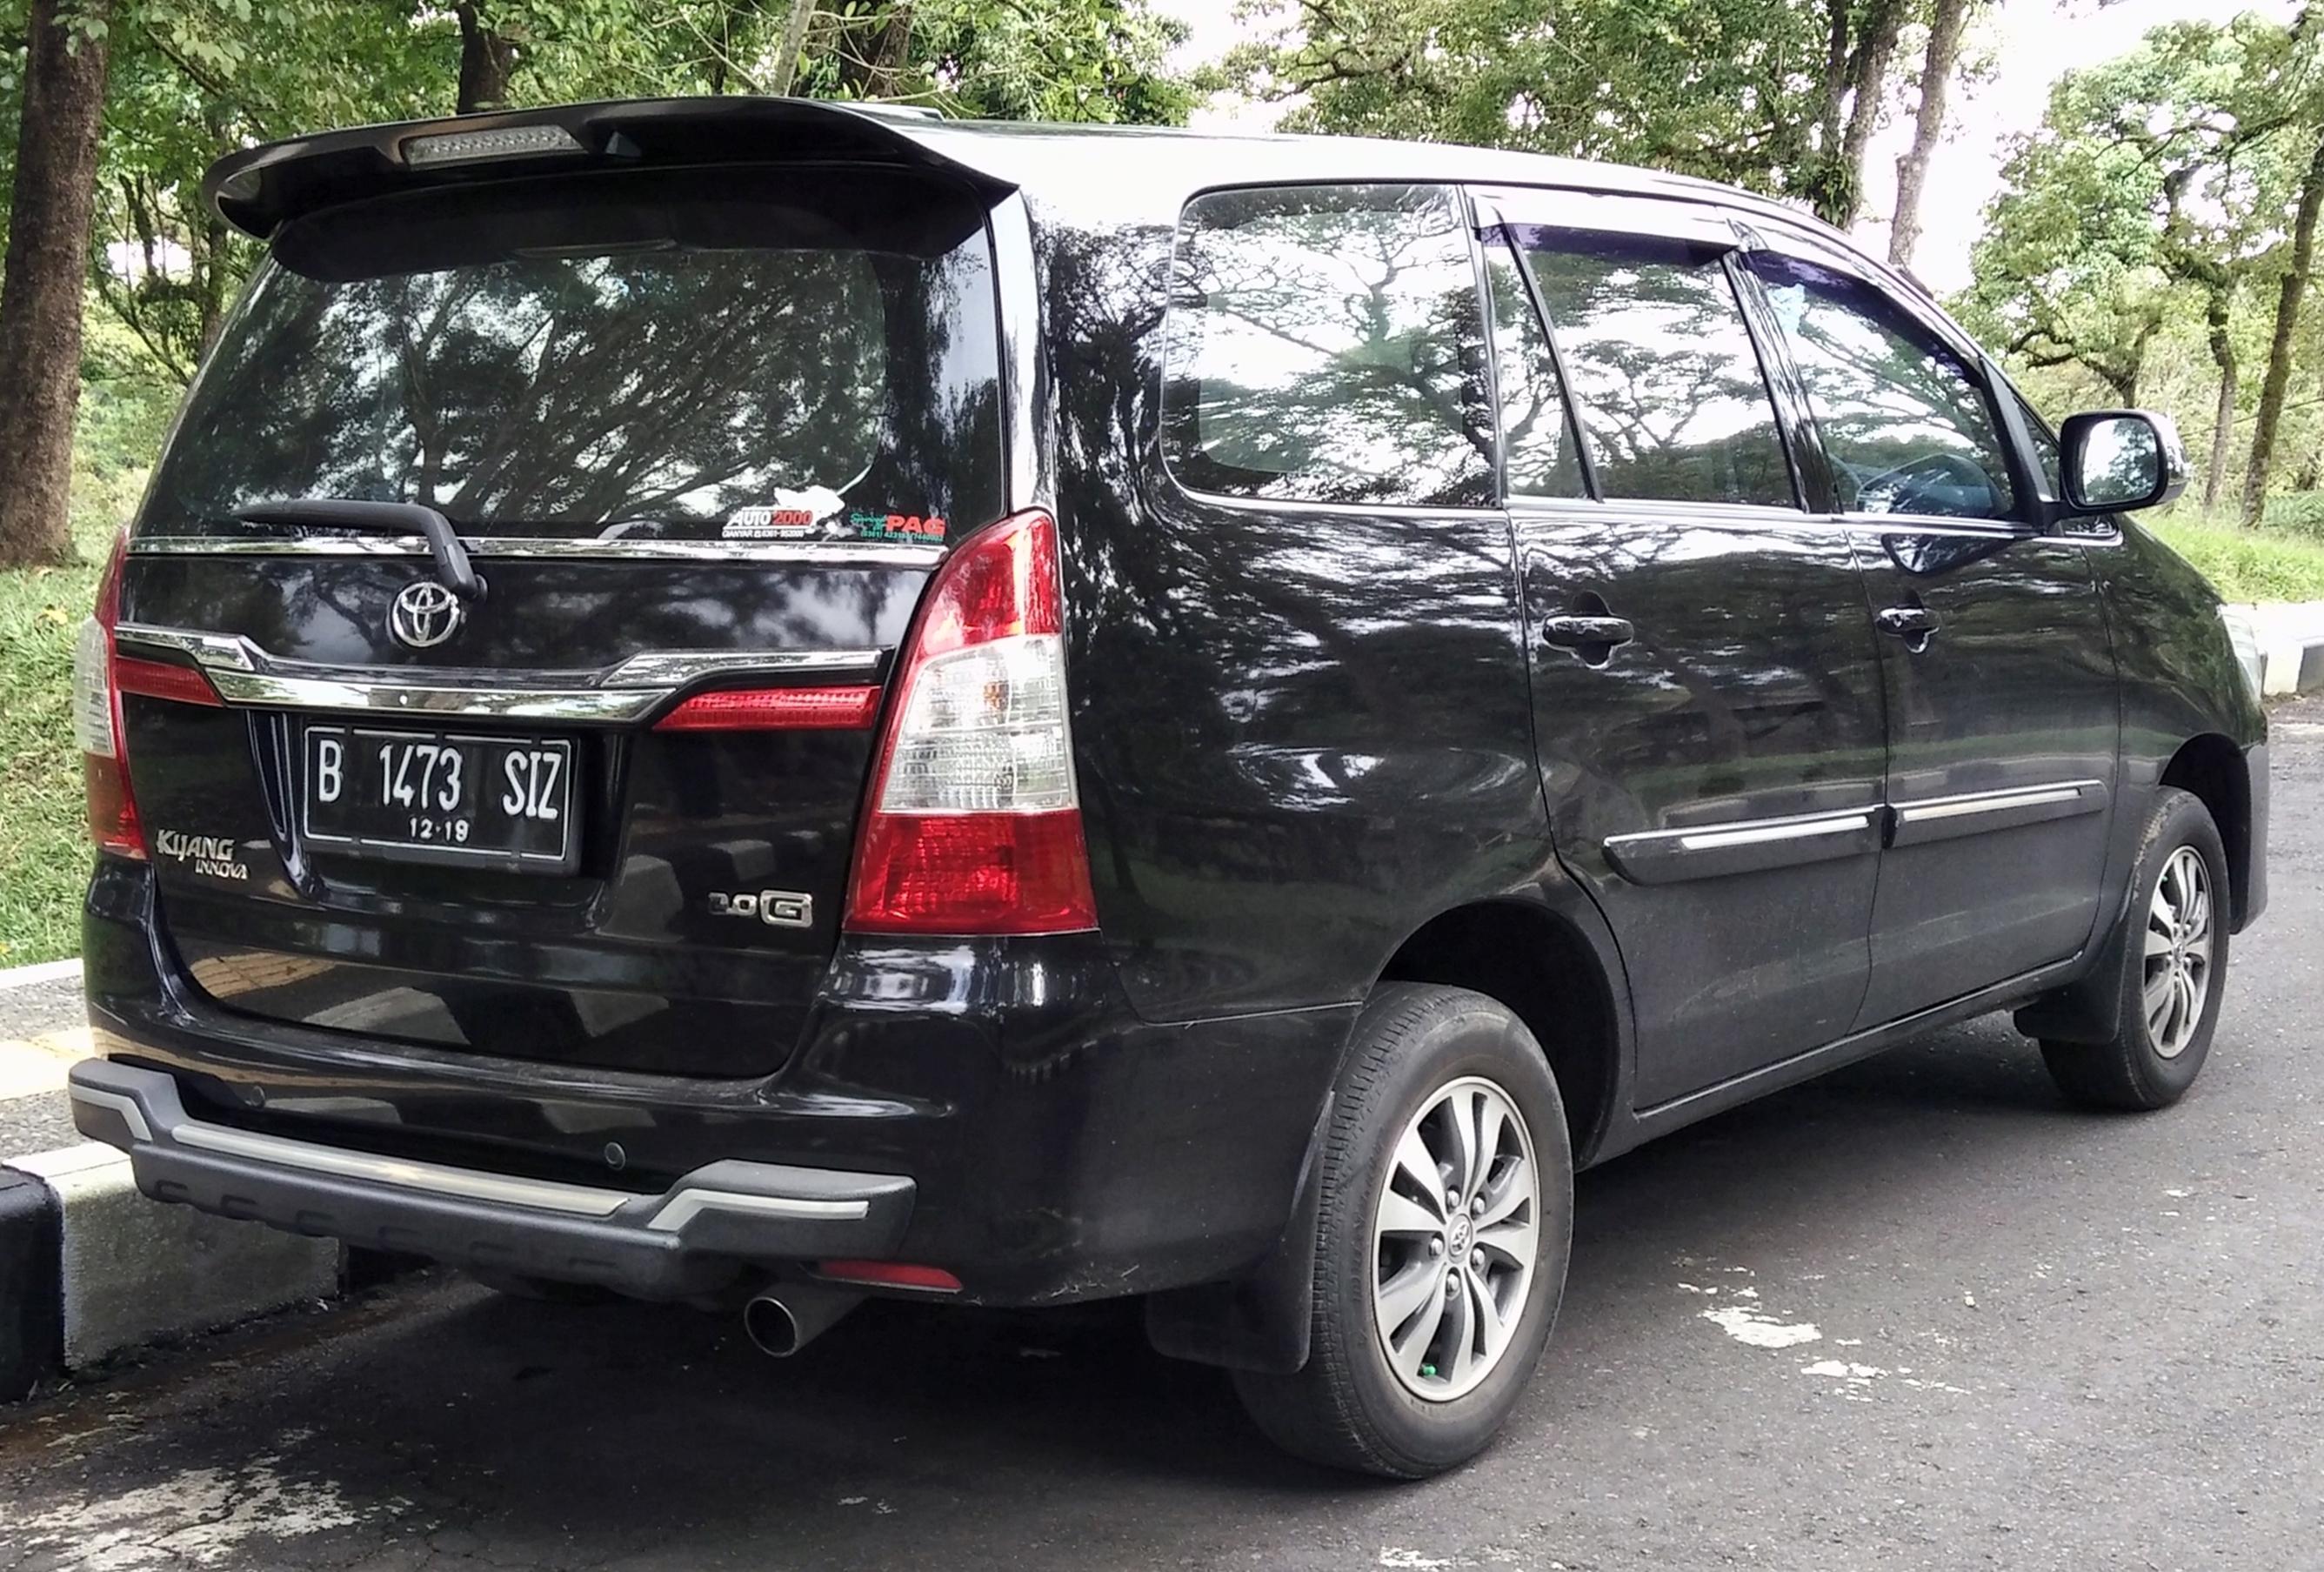 File:2014 Toyota Kijang Innova 2.0 G (rear), Candikuning